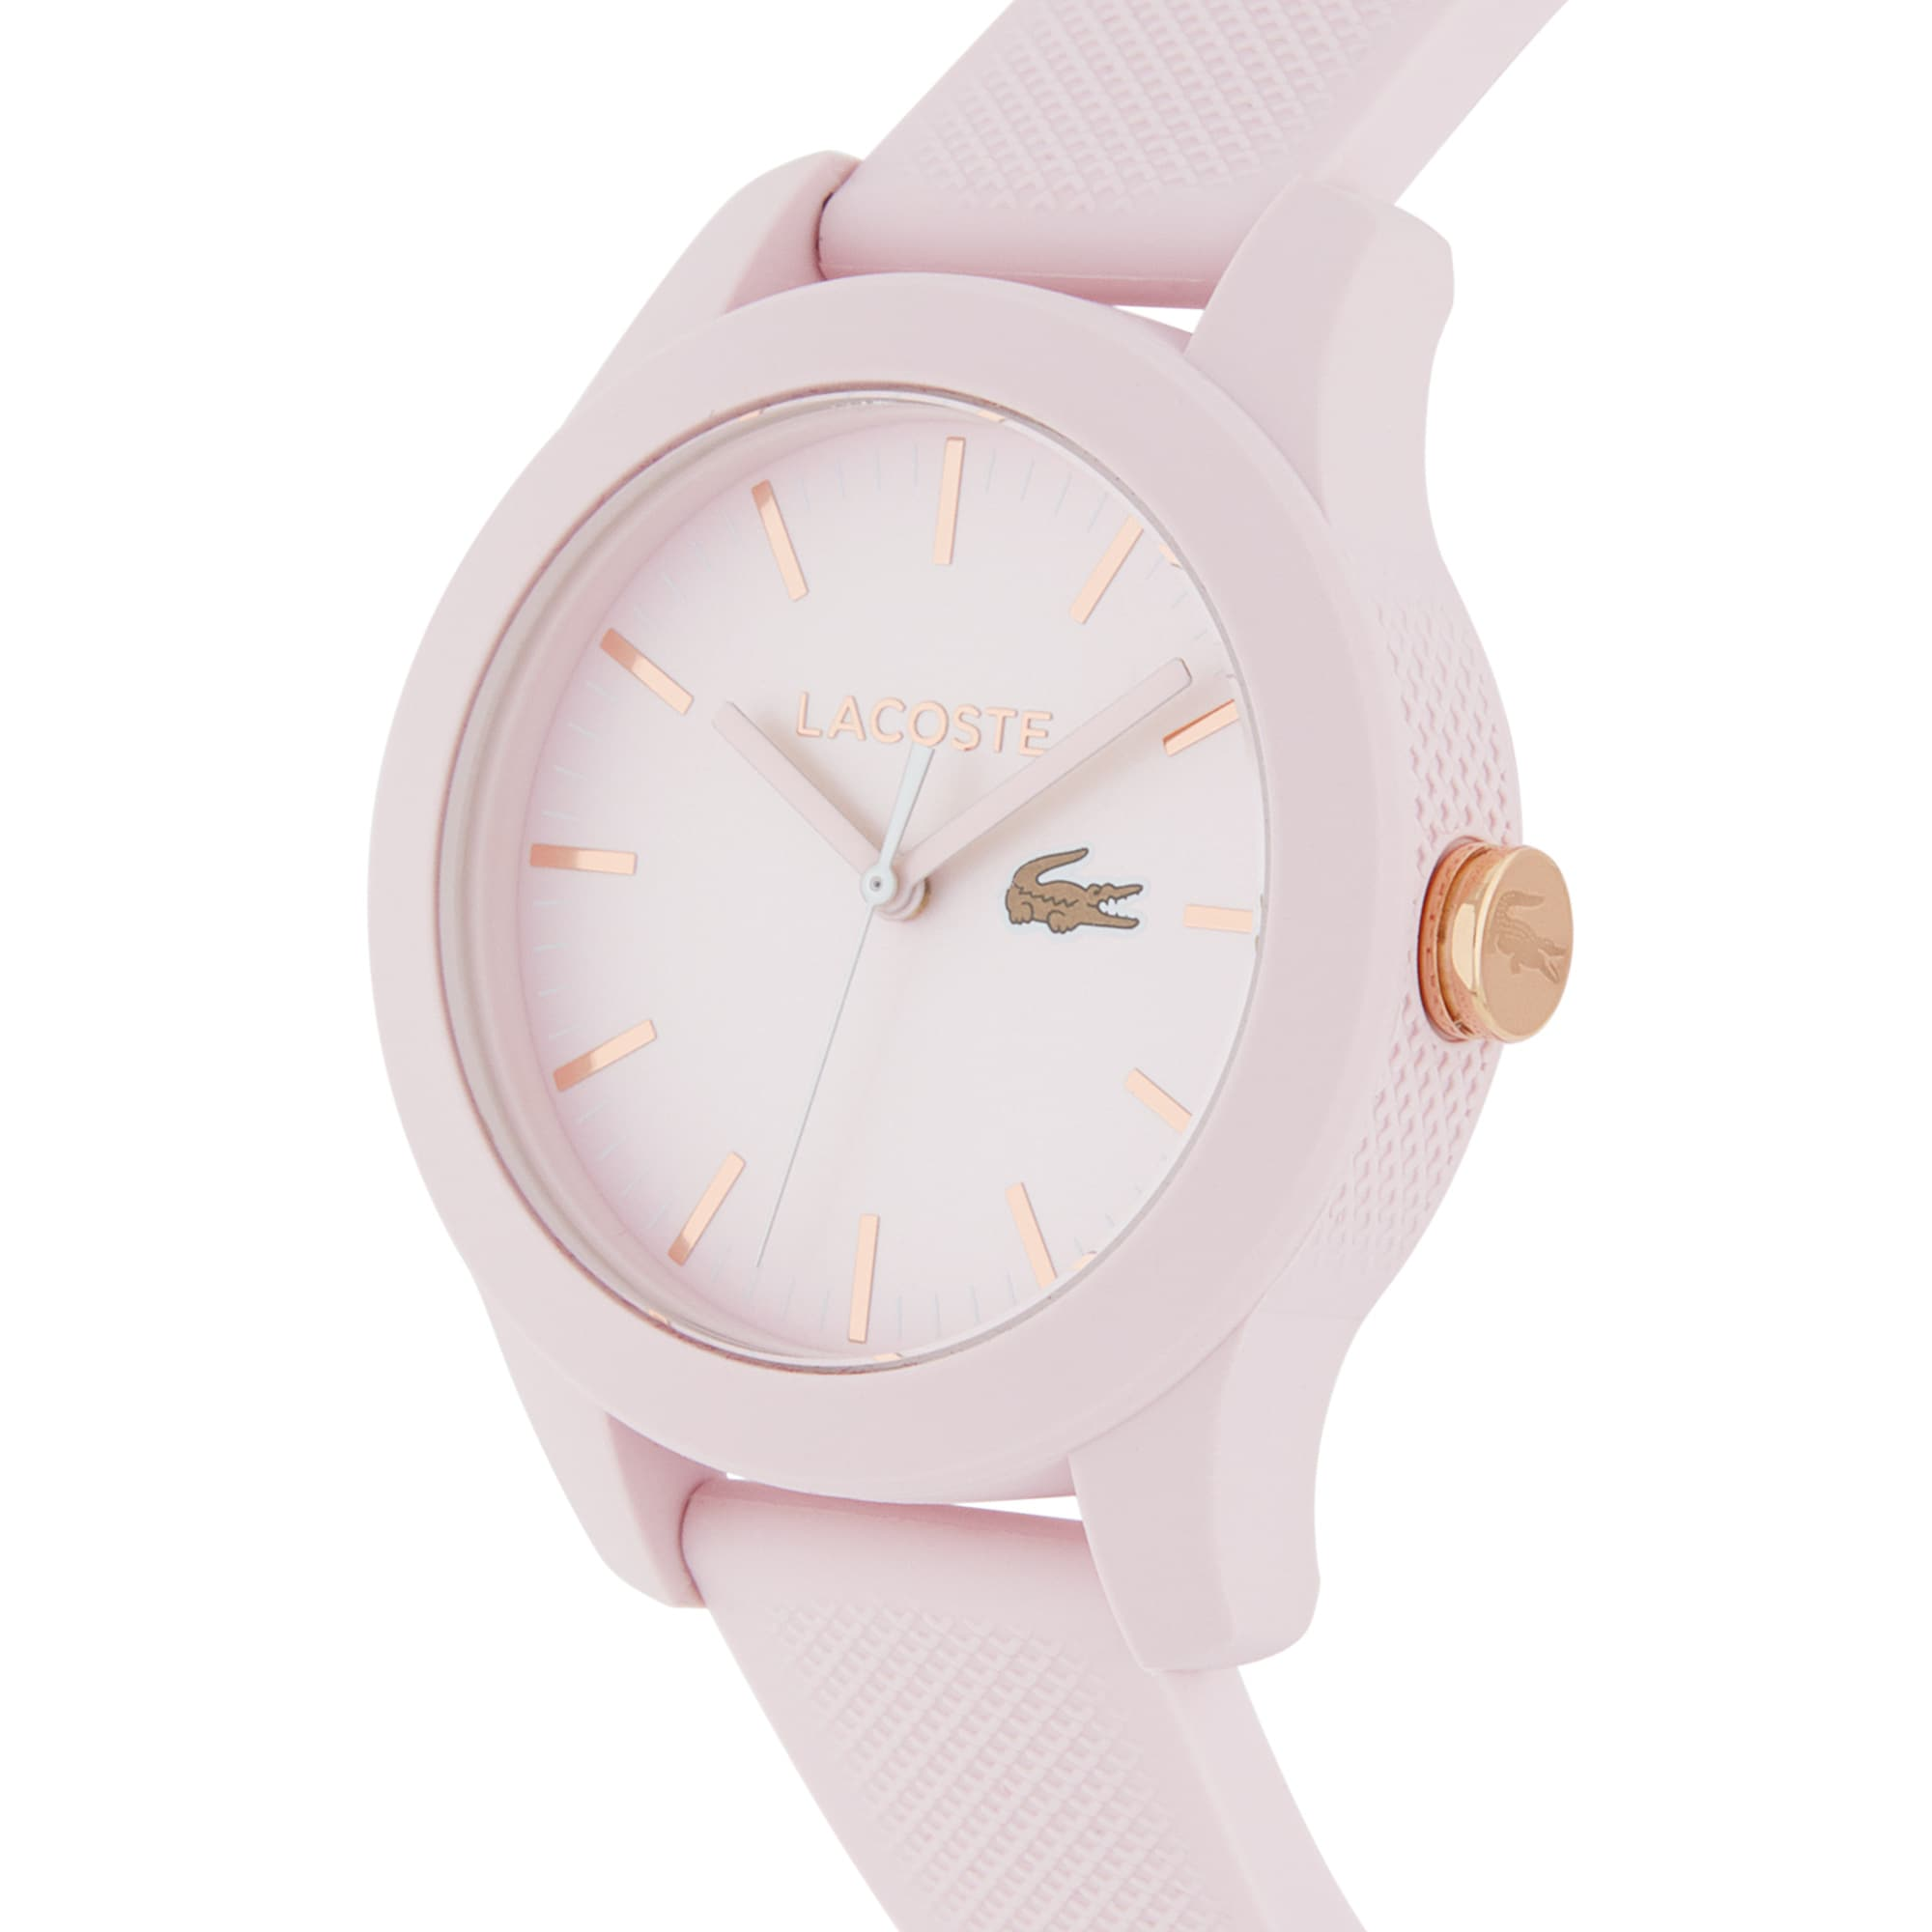 LACOSTE 12.12 Damenuhr mit pinkem Silikonband